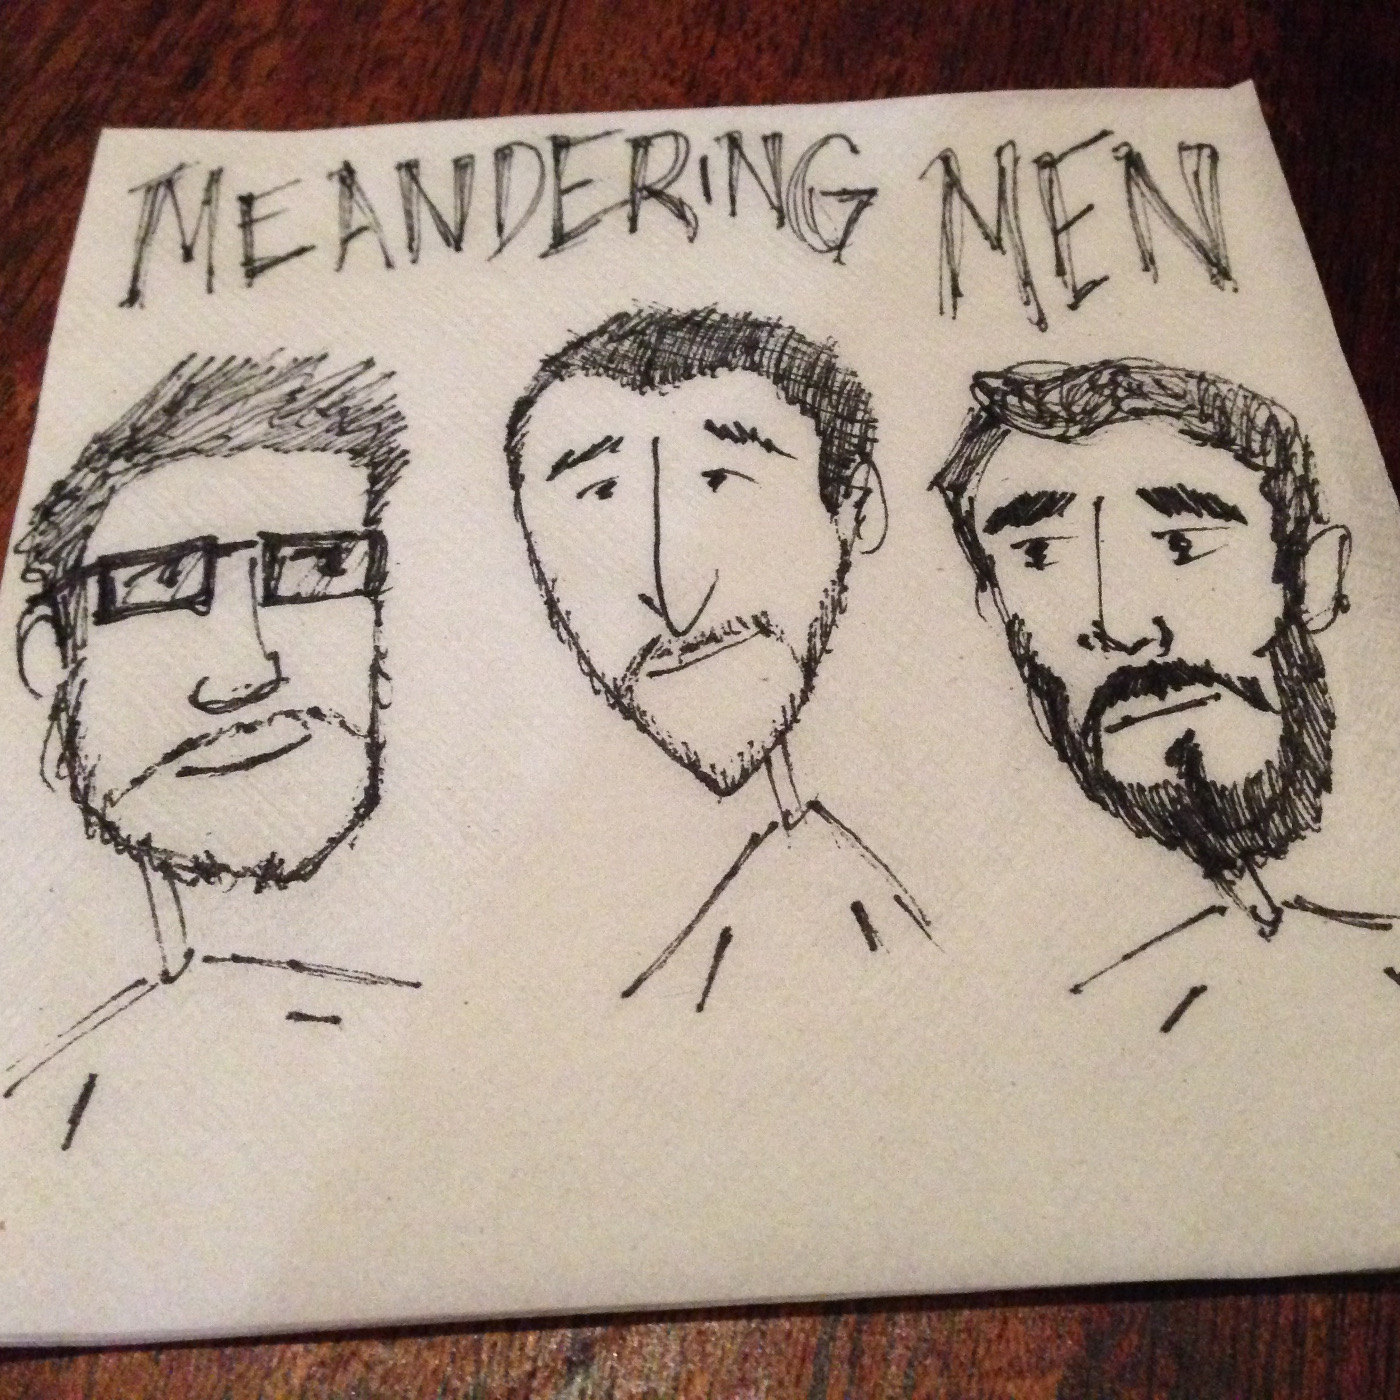 Meandering Men